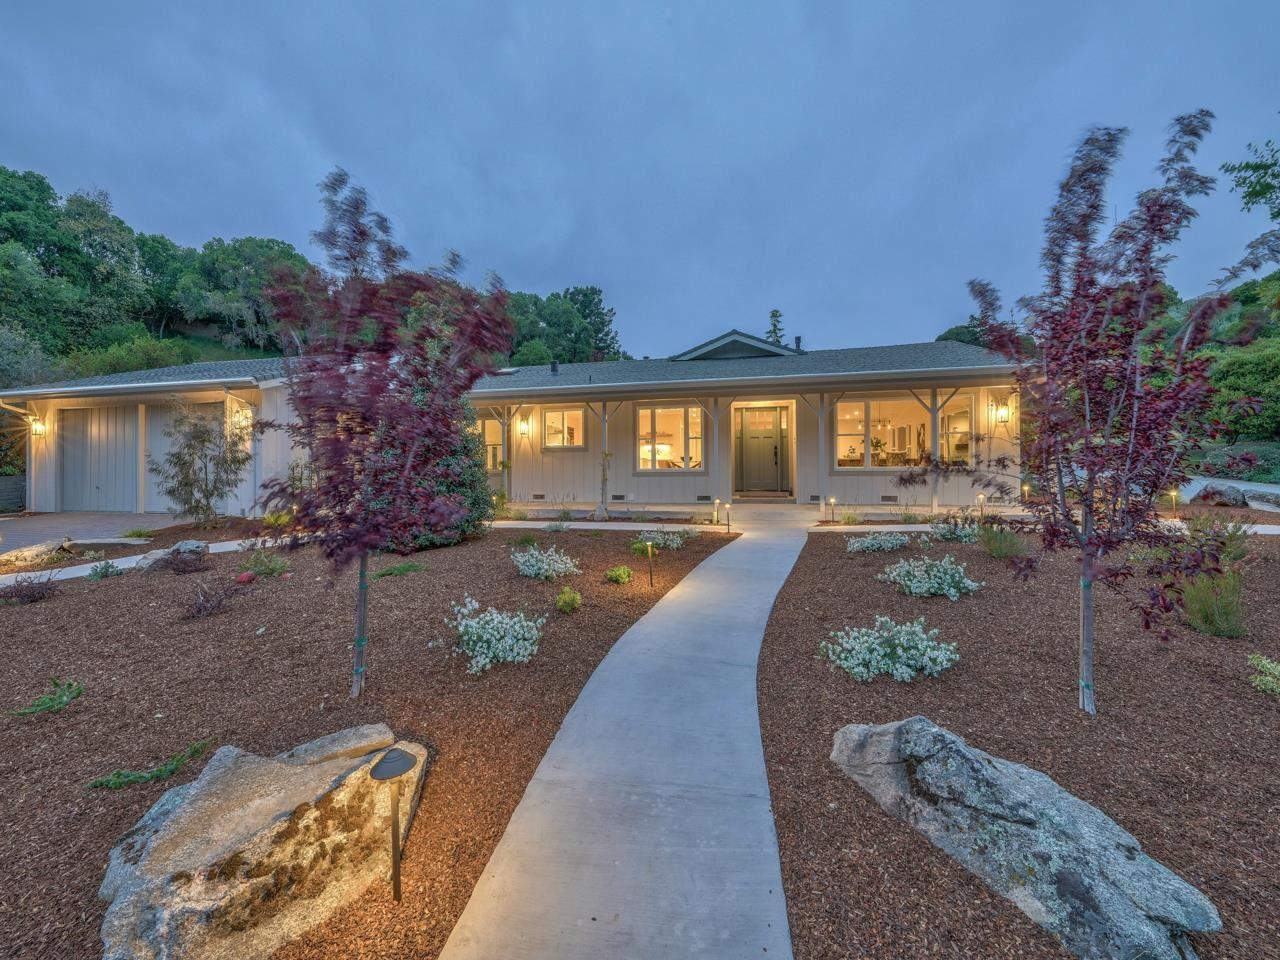 Photo for 10121 Blue Larkspur Lane, MONTEREY, CA 93940 (MLS # ML81840620)